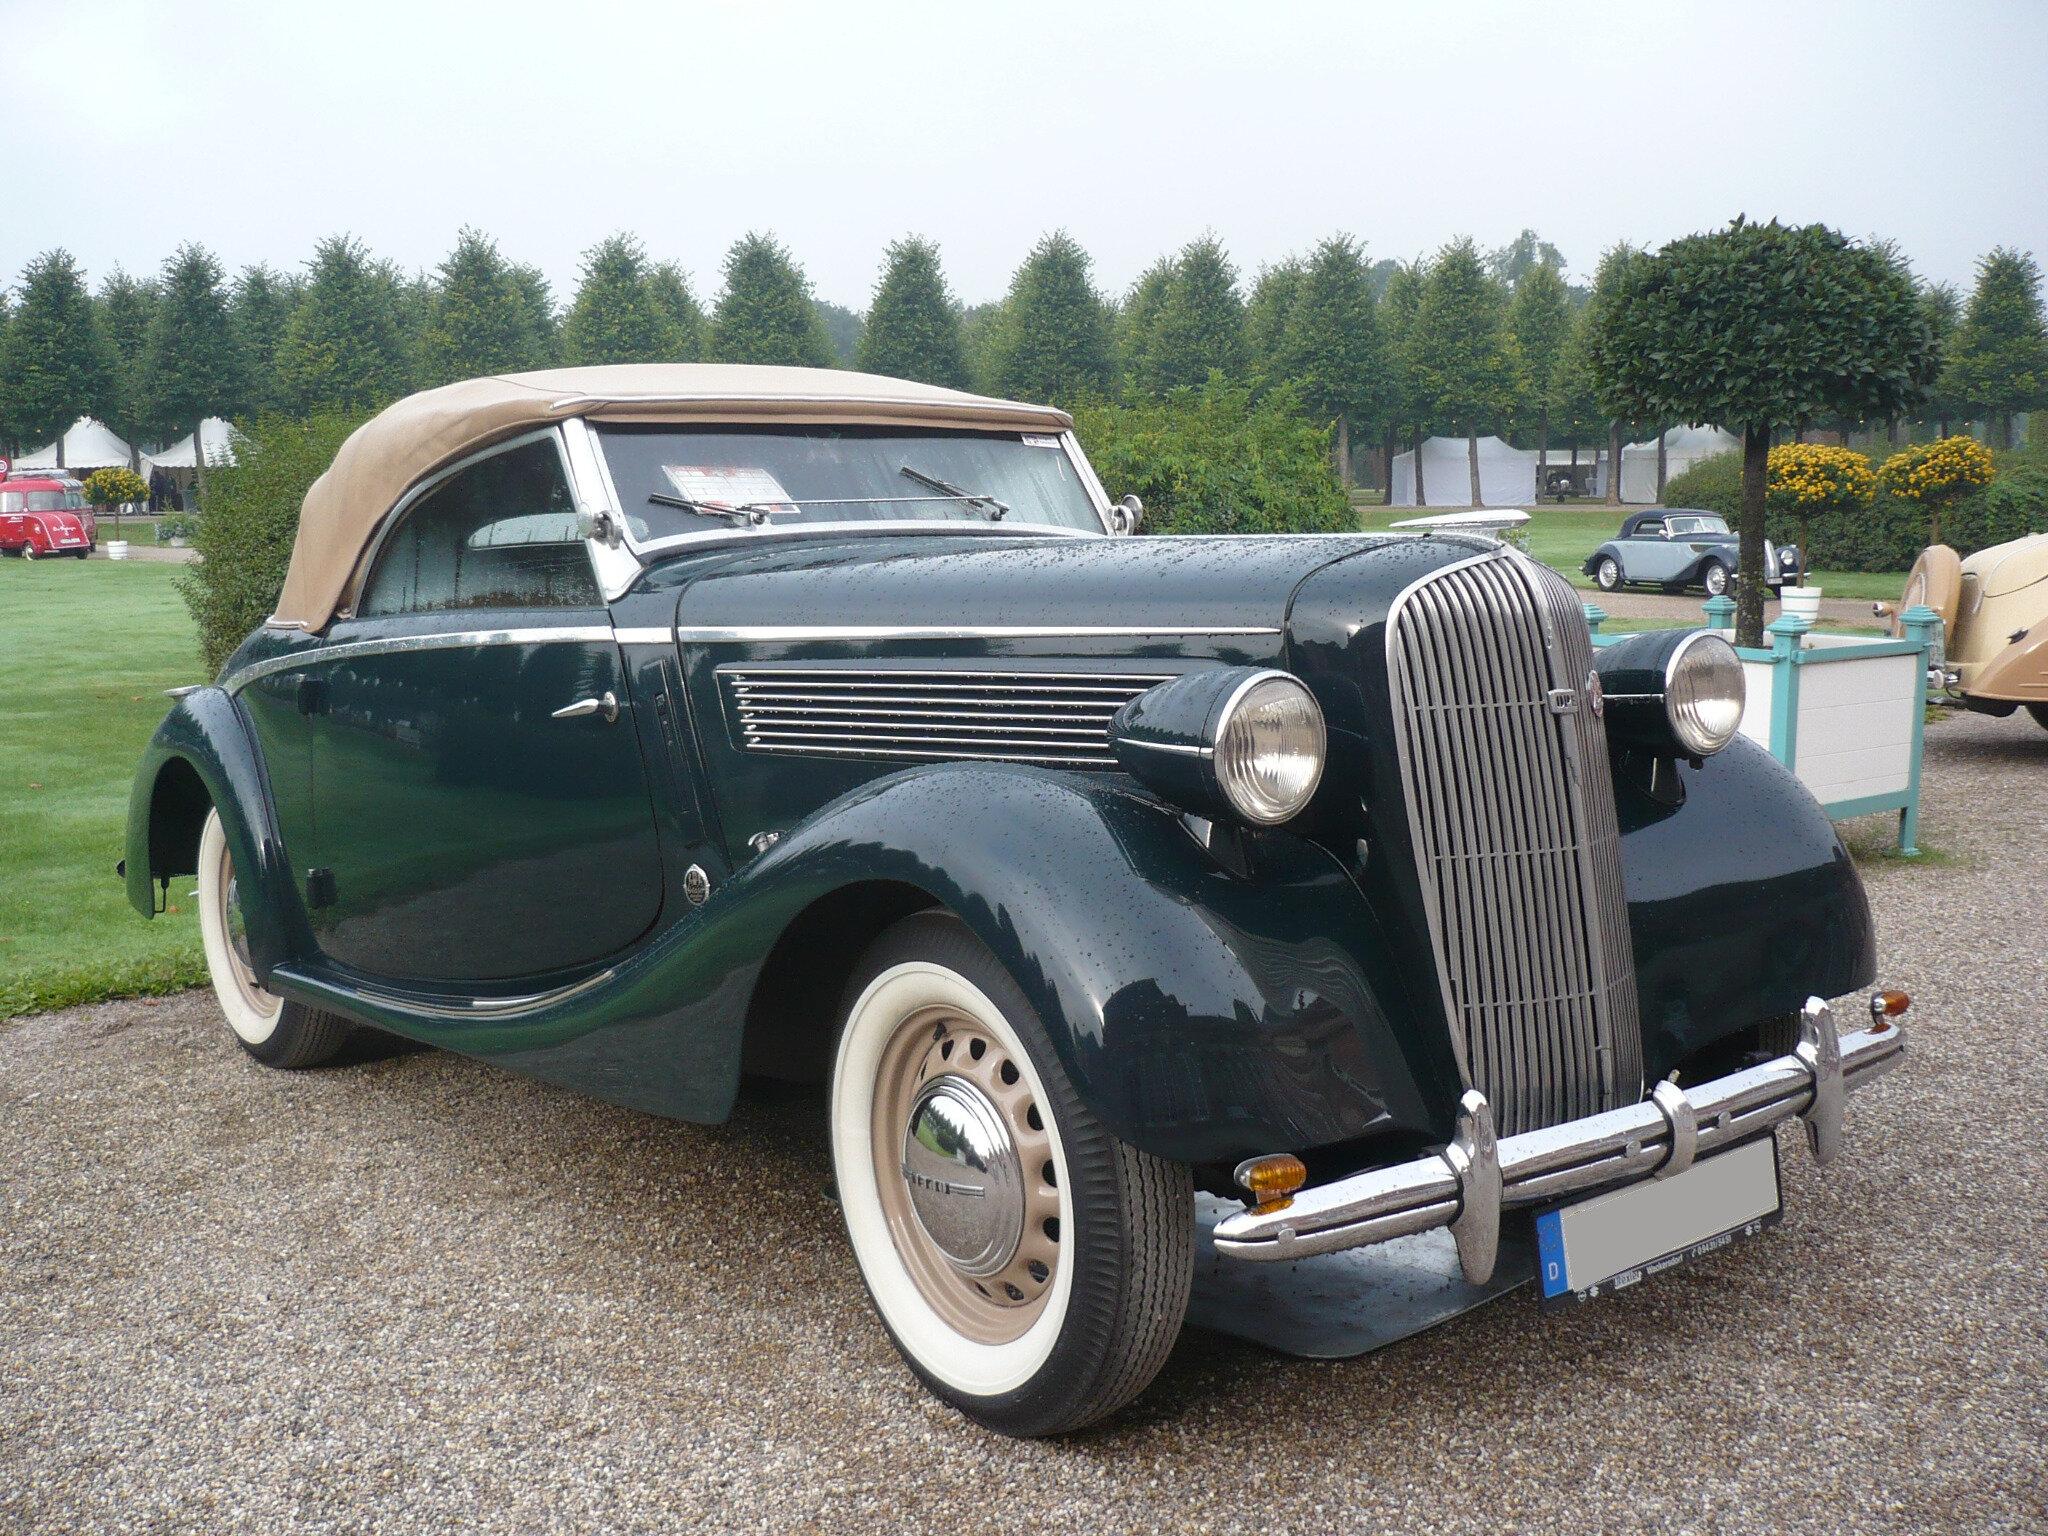 OPEL Super Six 2.5 Liter cabriolet Gläser 1937 Schwetzingen (1)